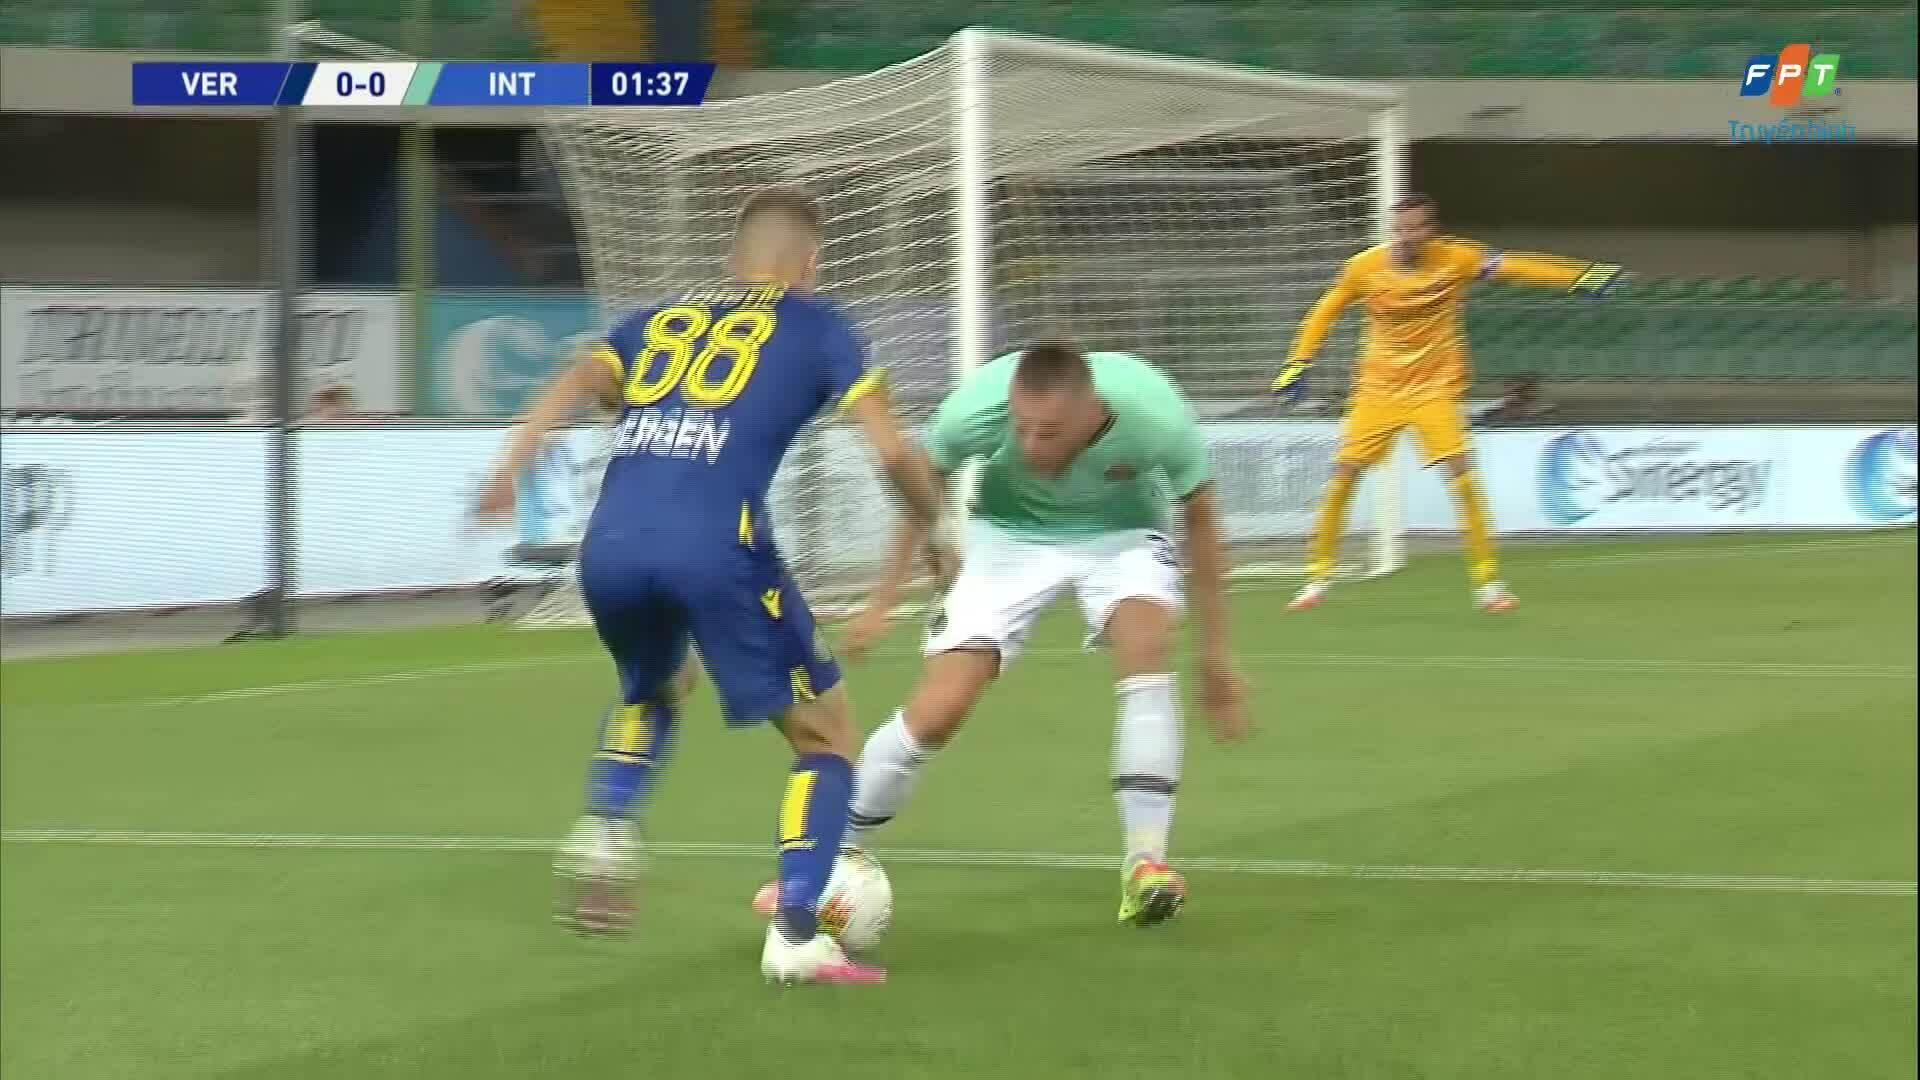 Verona 2-2 Inter